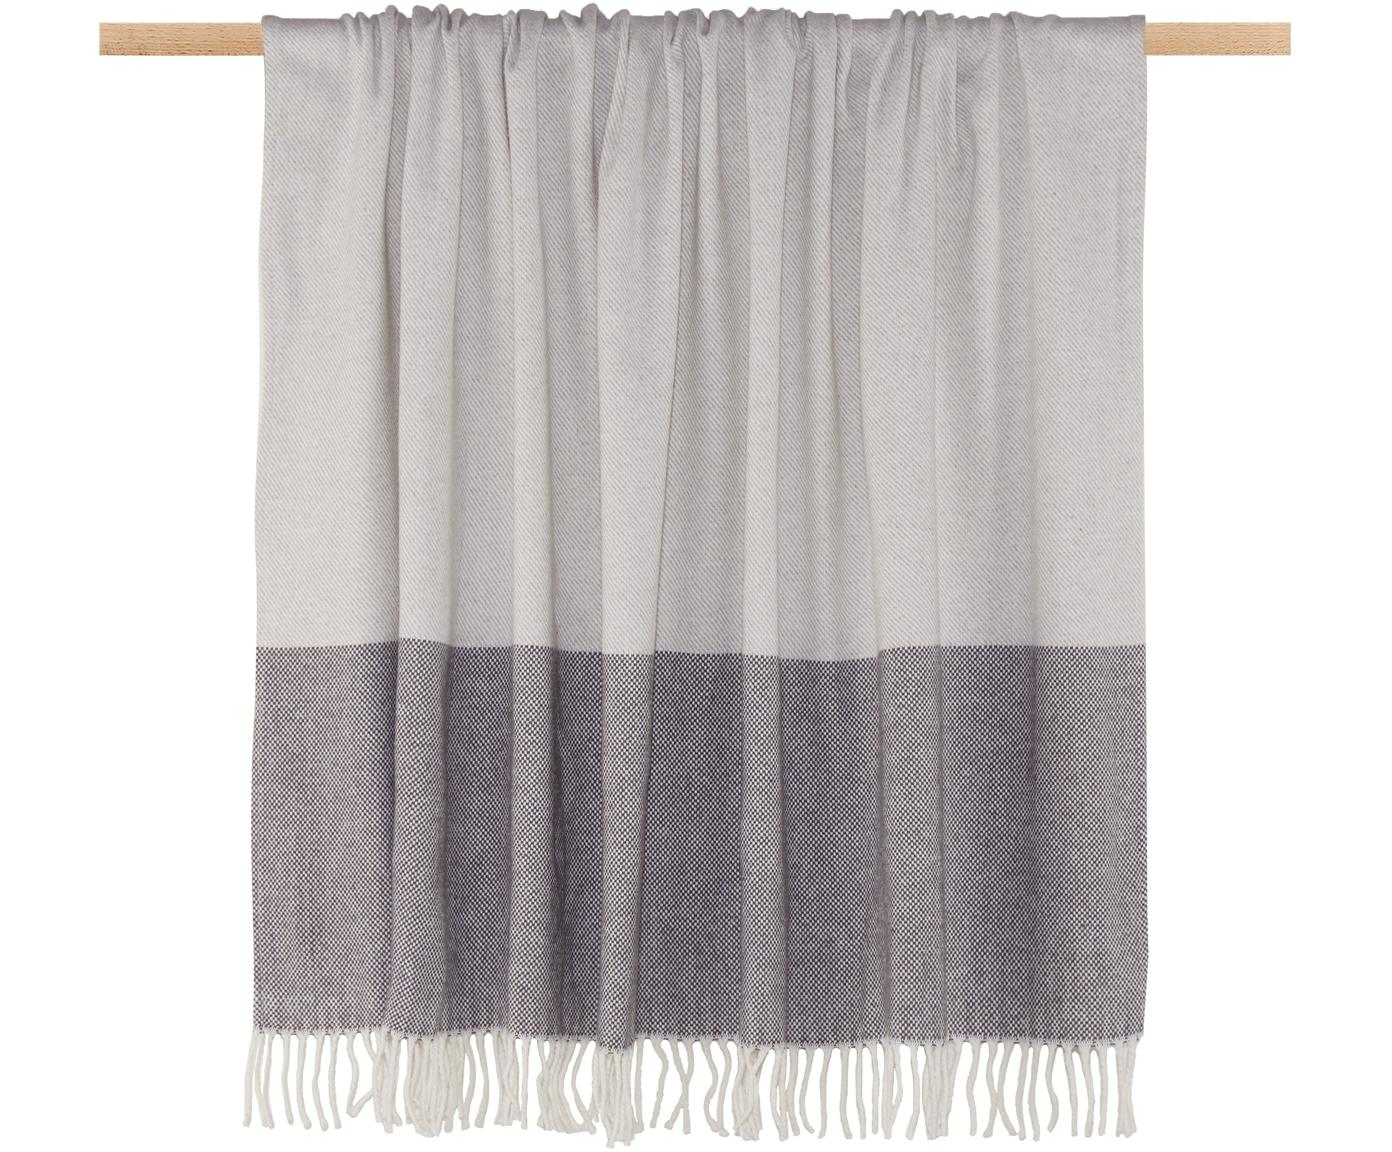 Plaid Stripes, 50% Baumwolle, 50% Polyacryl, Grautöne, 150 x 200 cm